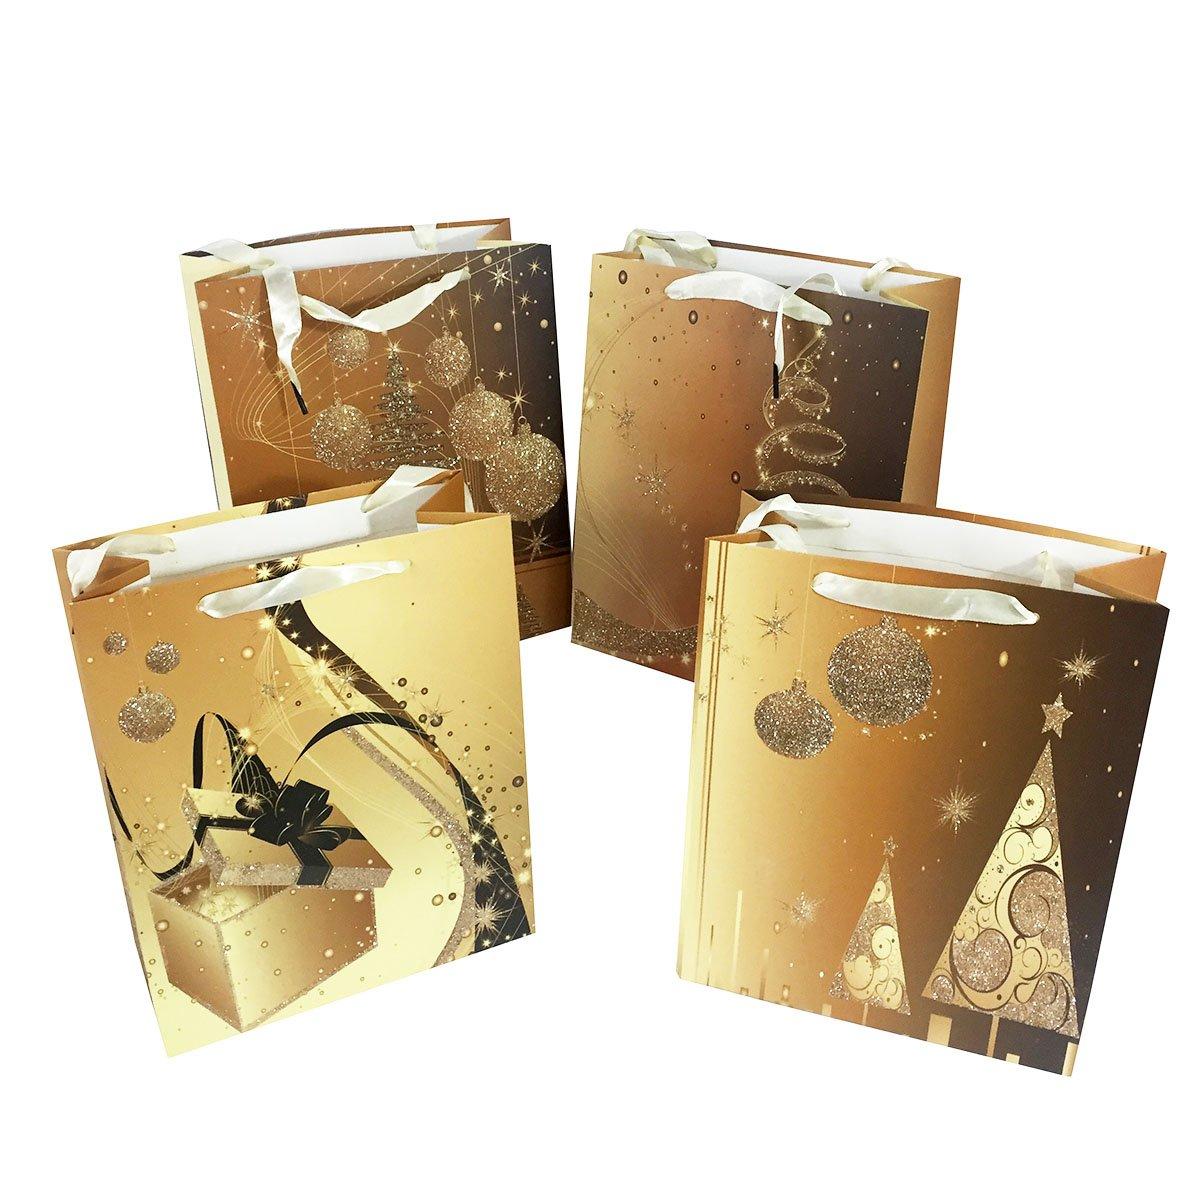 Allgala 12-PC Premium Christmas Printed Gift Bags, 10' 10